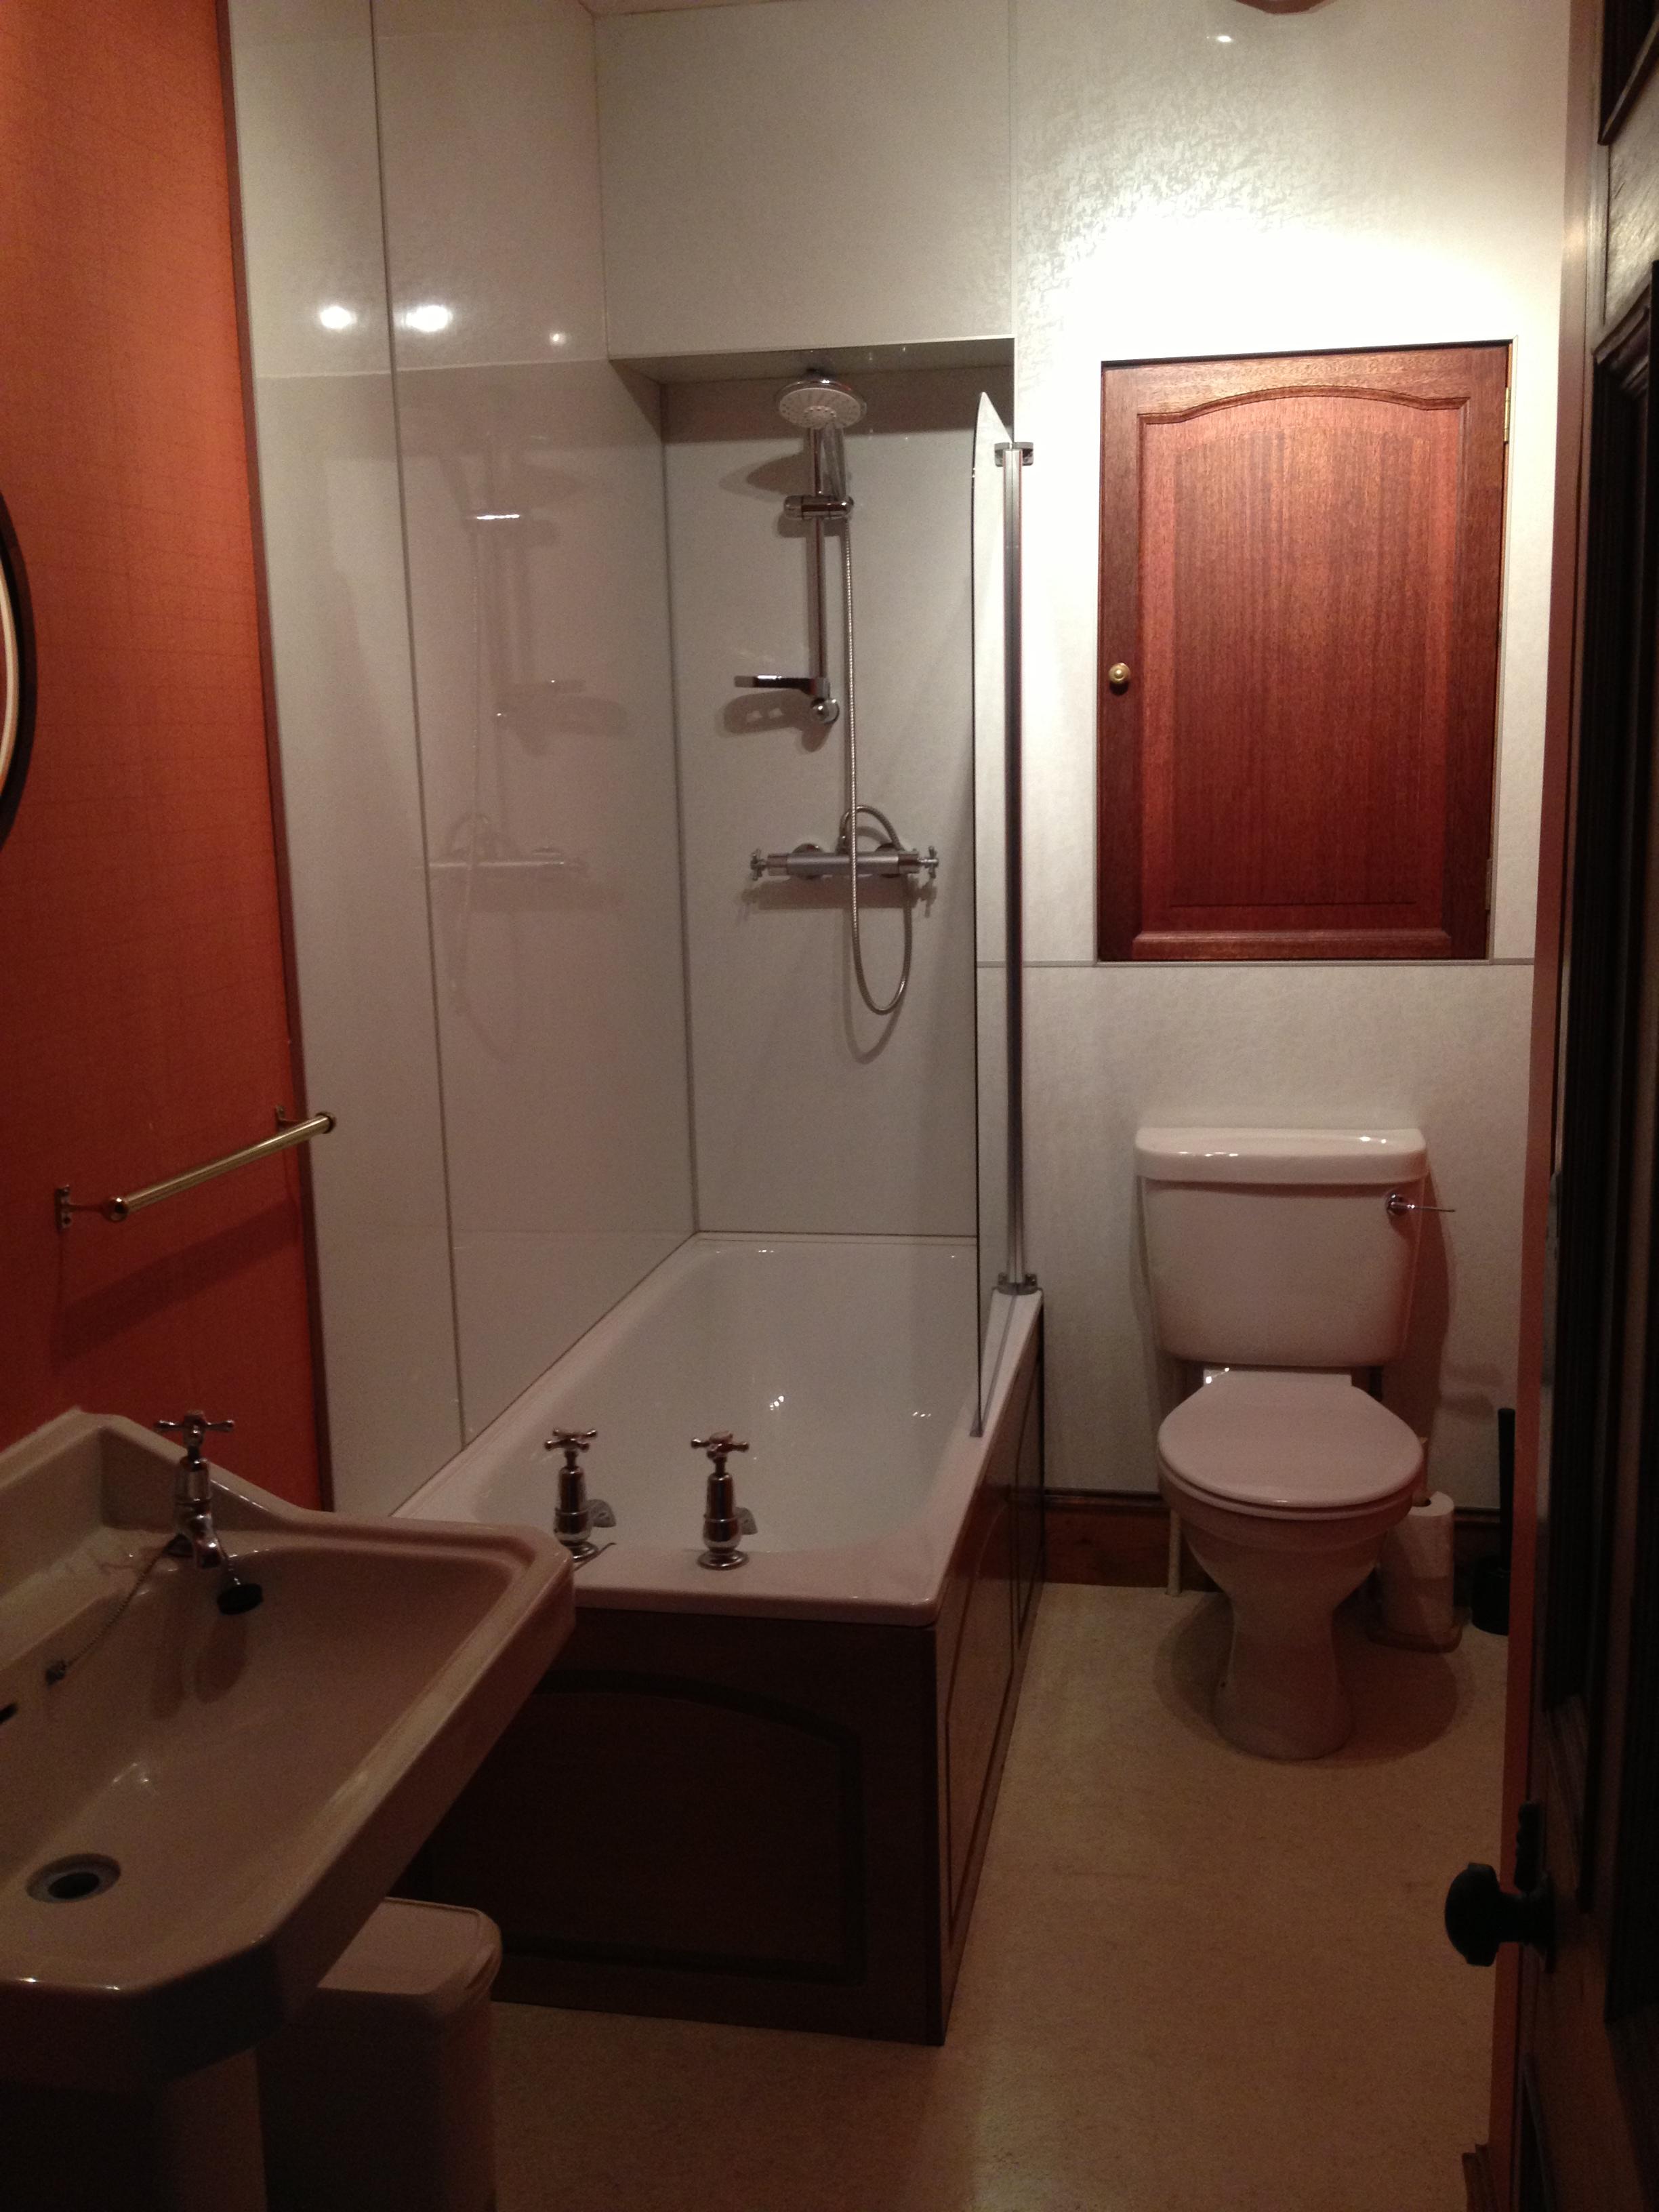 Hilton bathroom 2